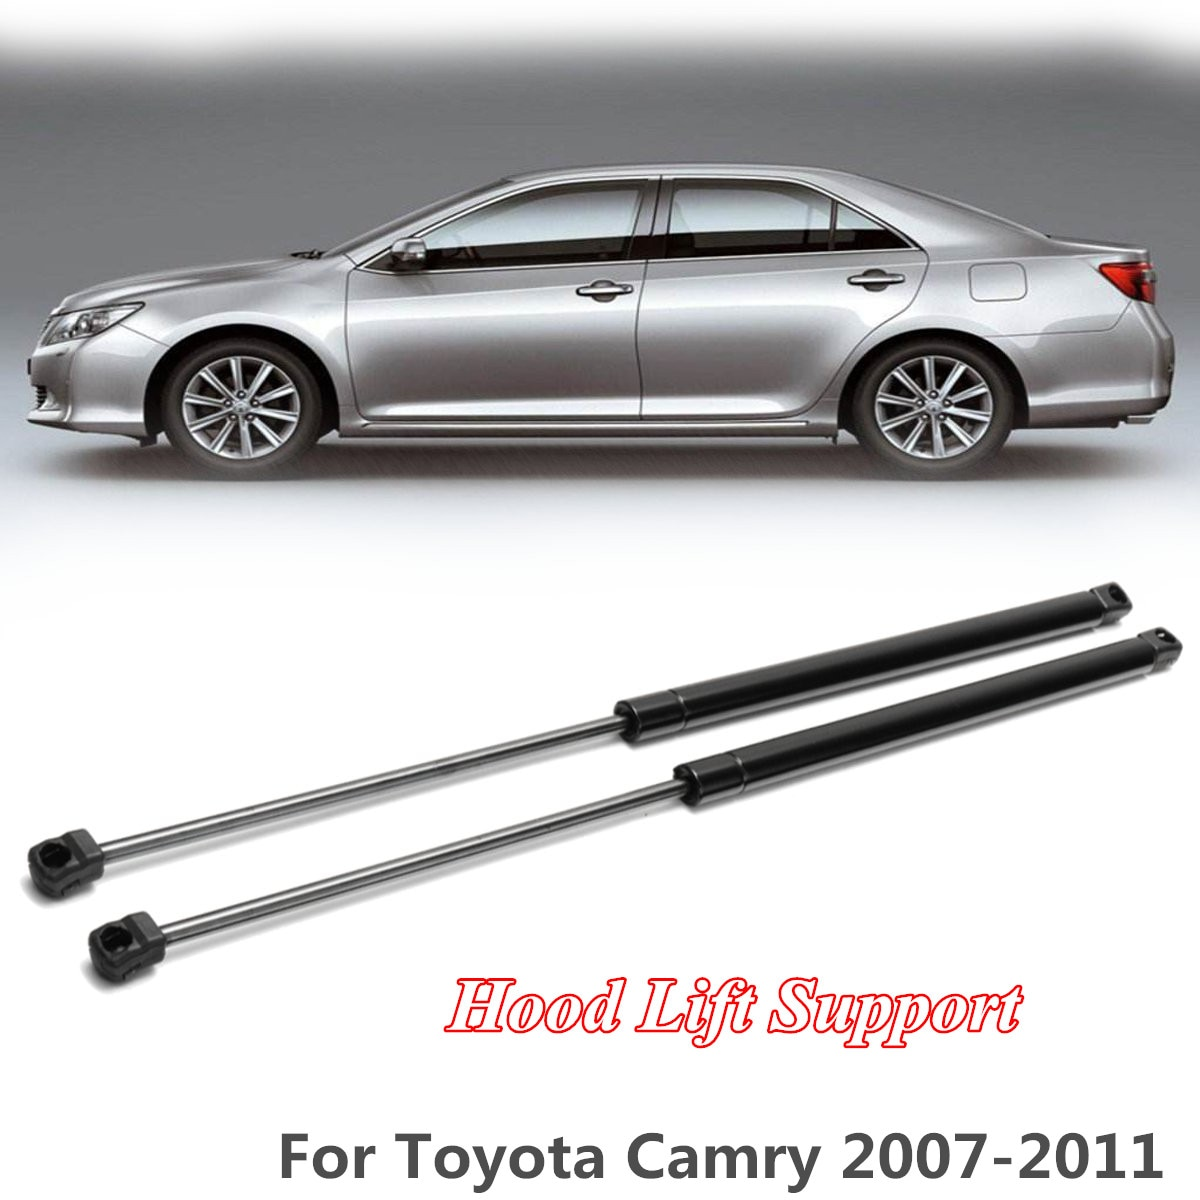 2x frente capa gás elevador apoio choque strut barras amortecedor barra de apoio braço 29024 para toyota camry 2007 2008 2009 2010 2011